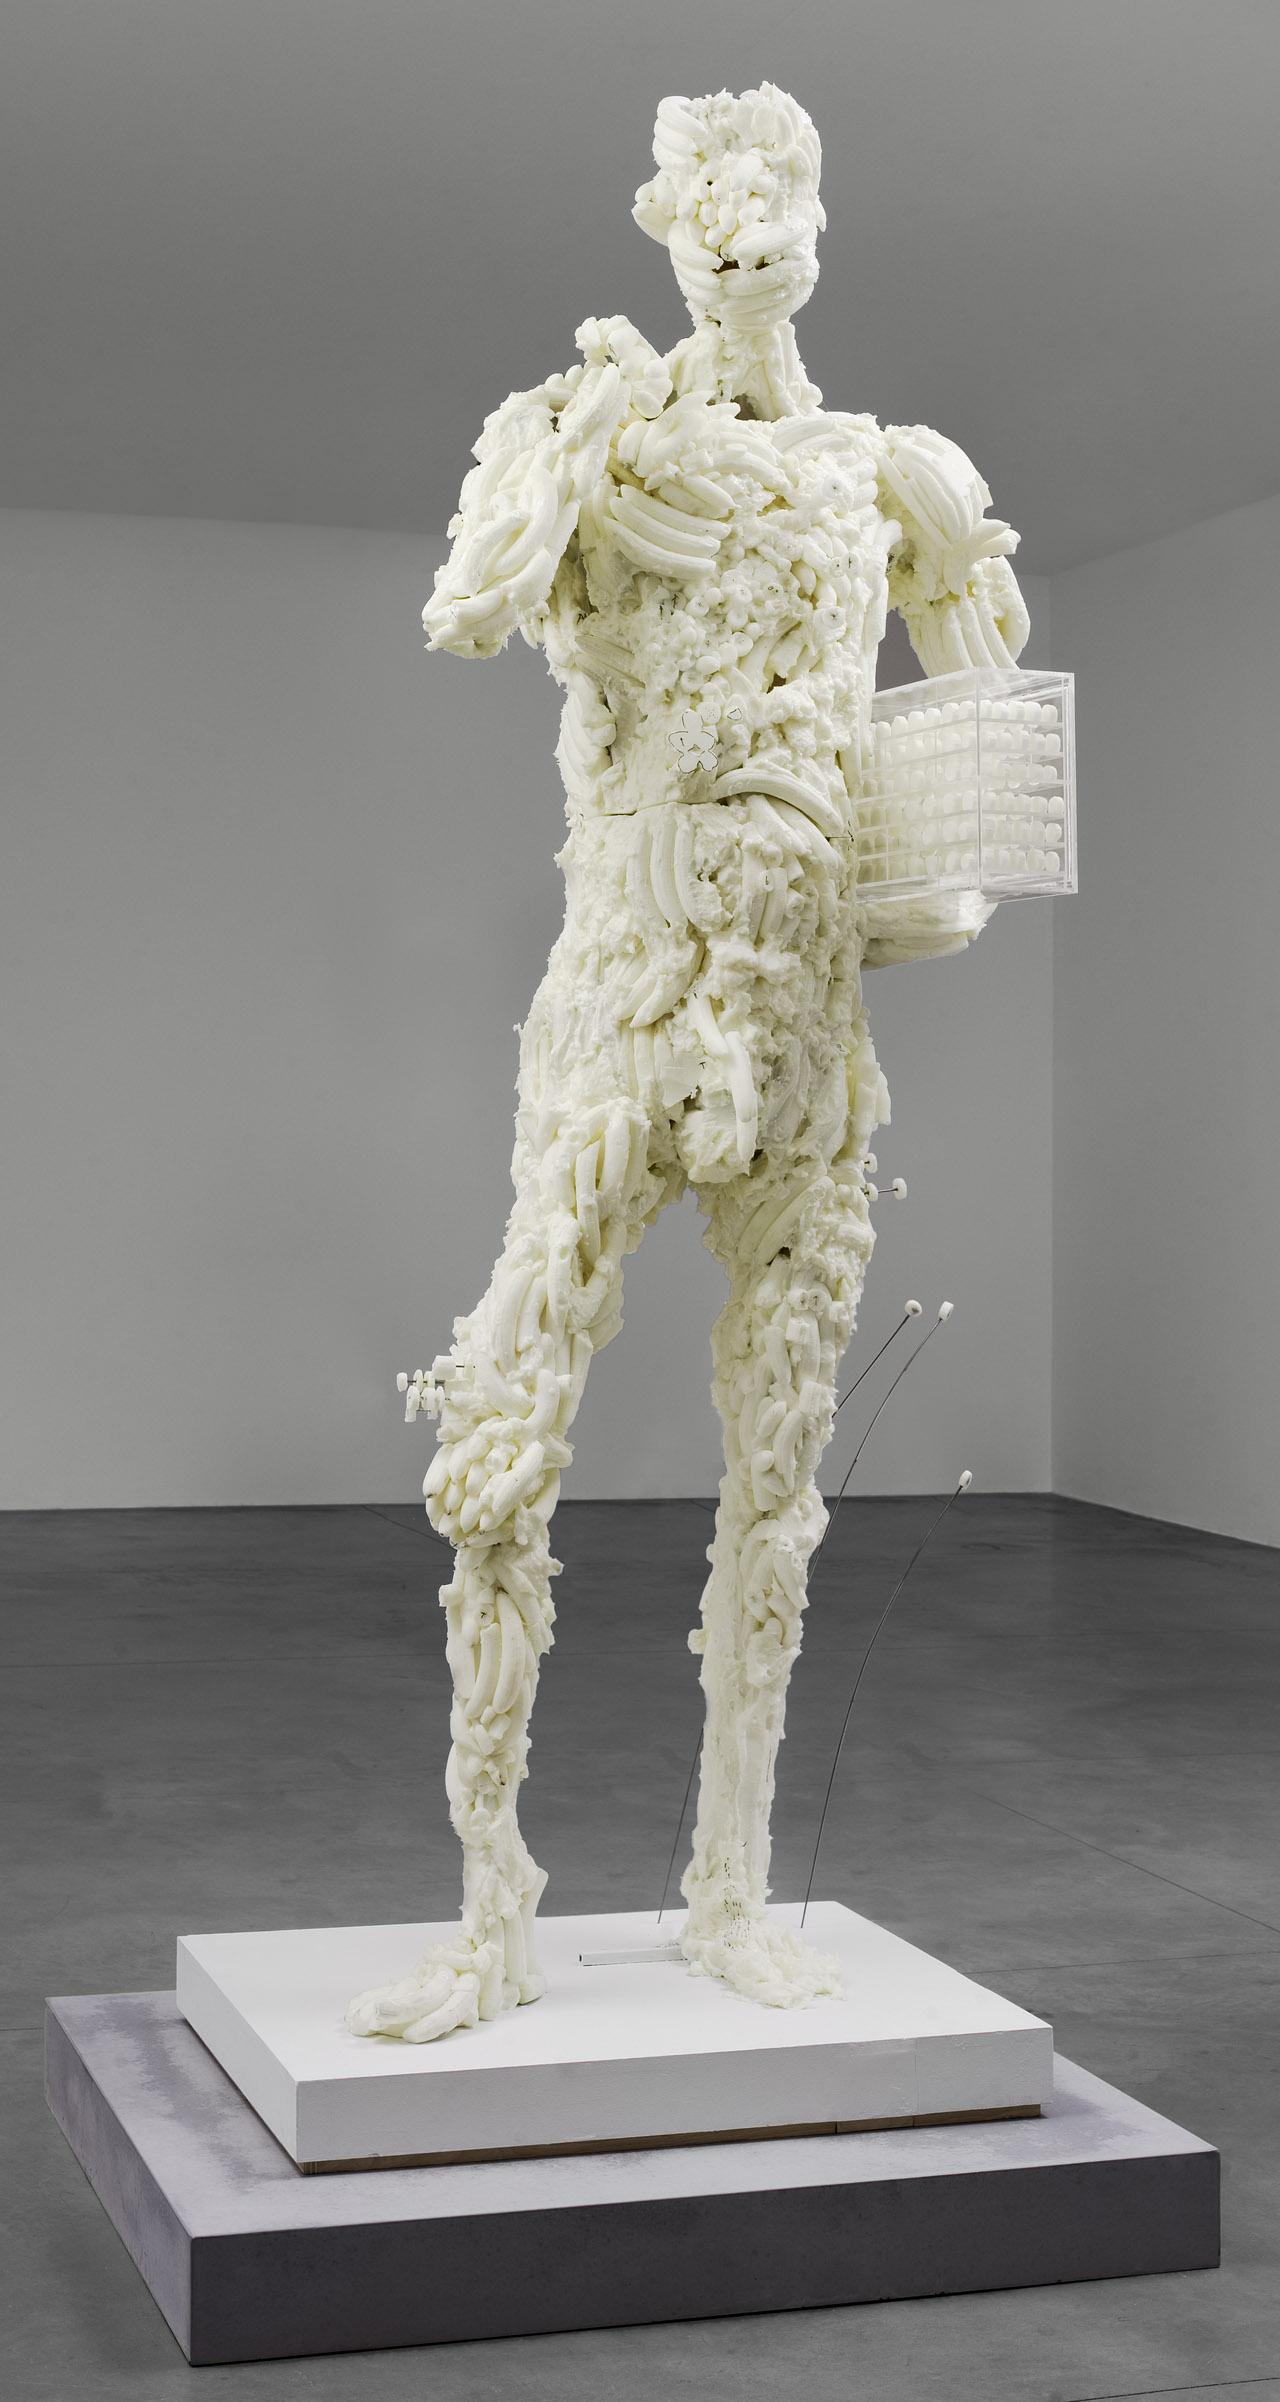 "David Altmejd, ""abcdefghijklmnopqrstuvwxyz"" (2013) (photo by Kurt Deruyter © David Altmejd, image courtesy of Andrea Rosen Gallery, New York)"